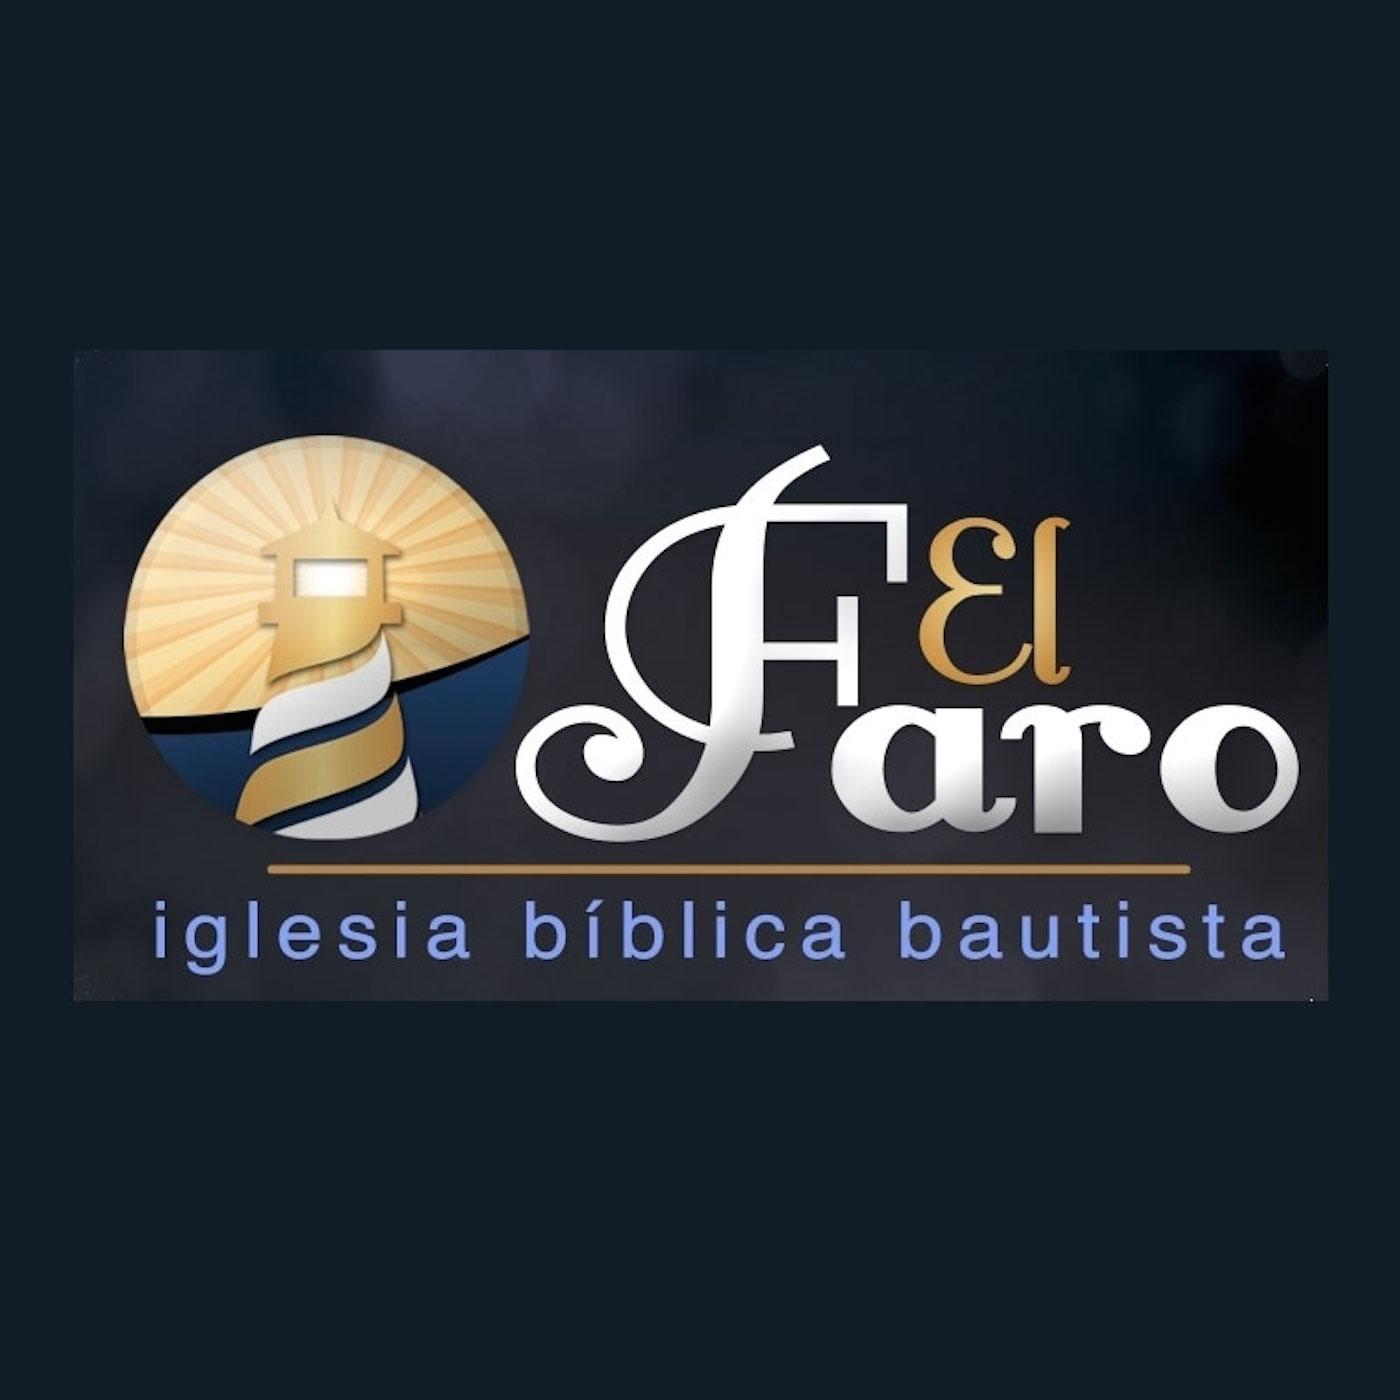 El Faro | Iglesia Bíblica Bautista